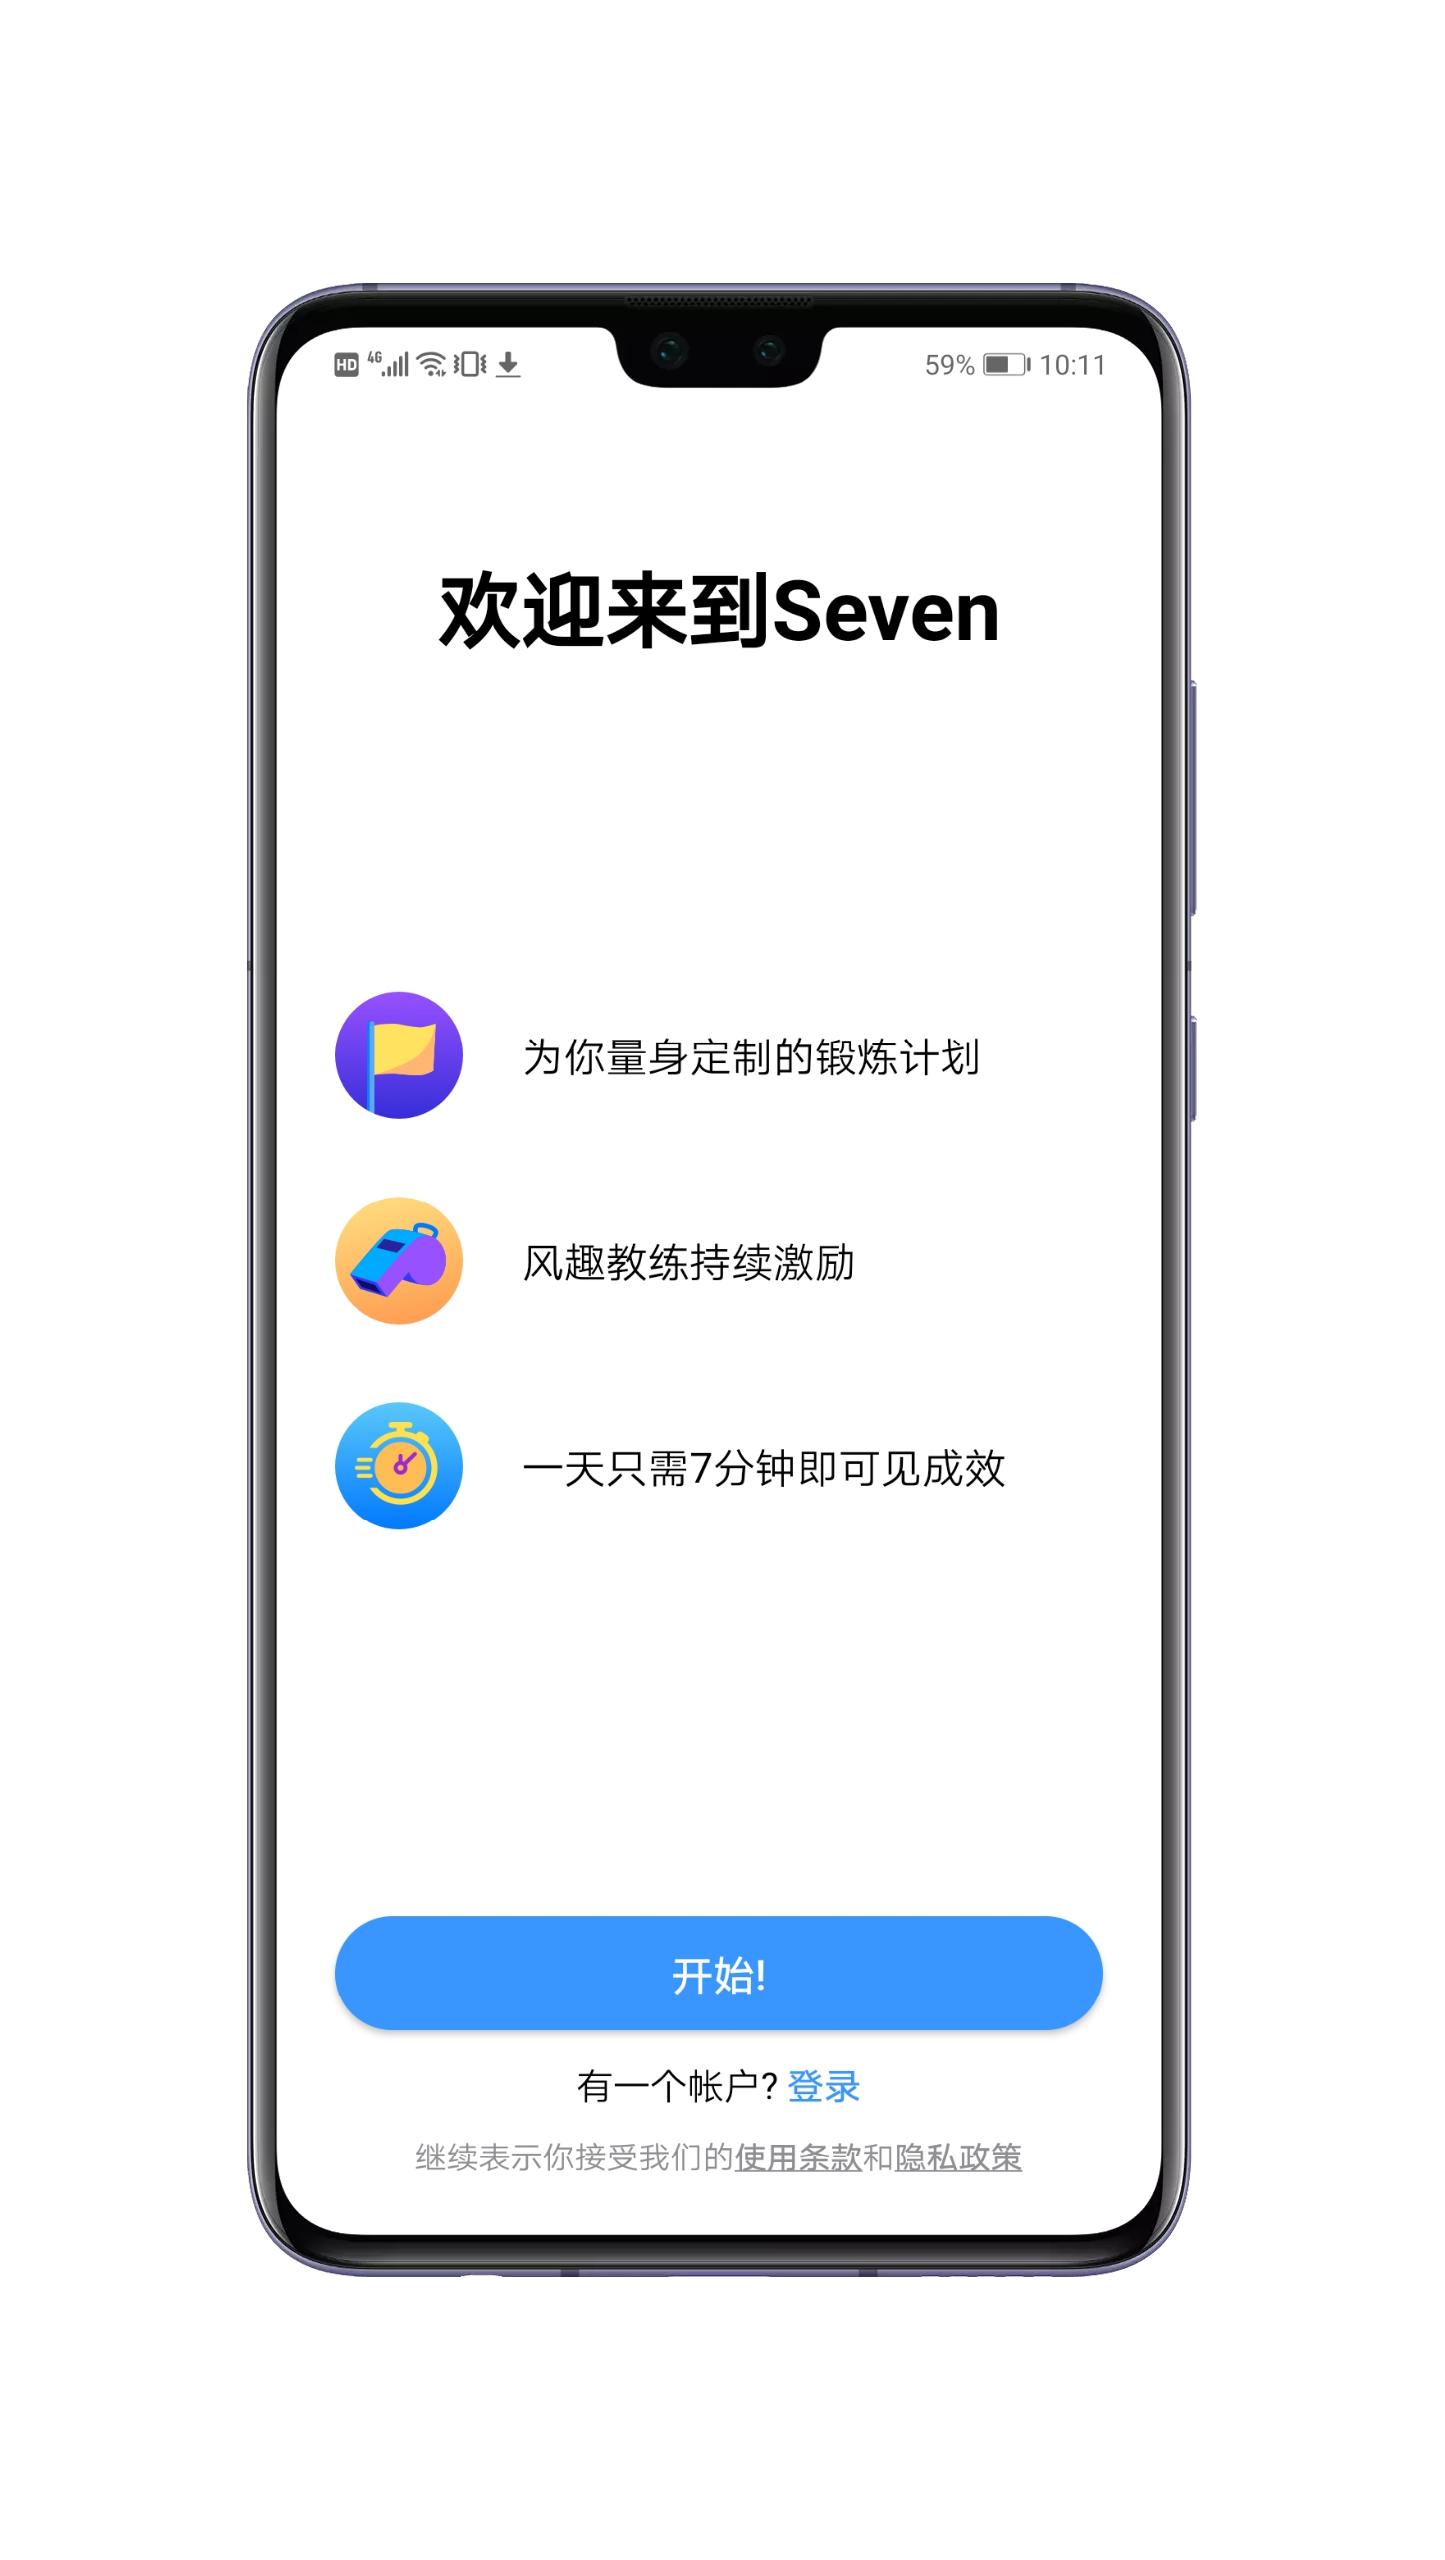 【分享】Seven七分钟锻炼8.4.1